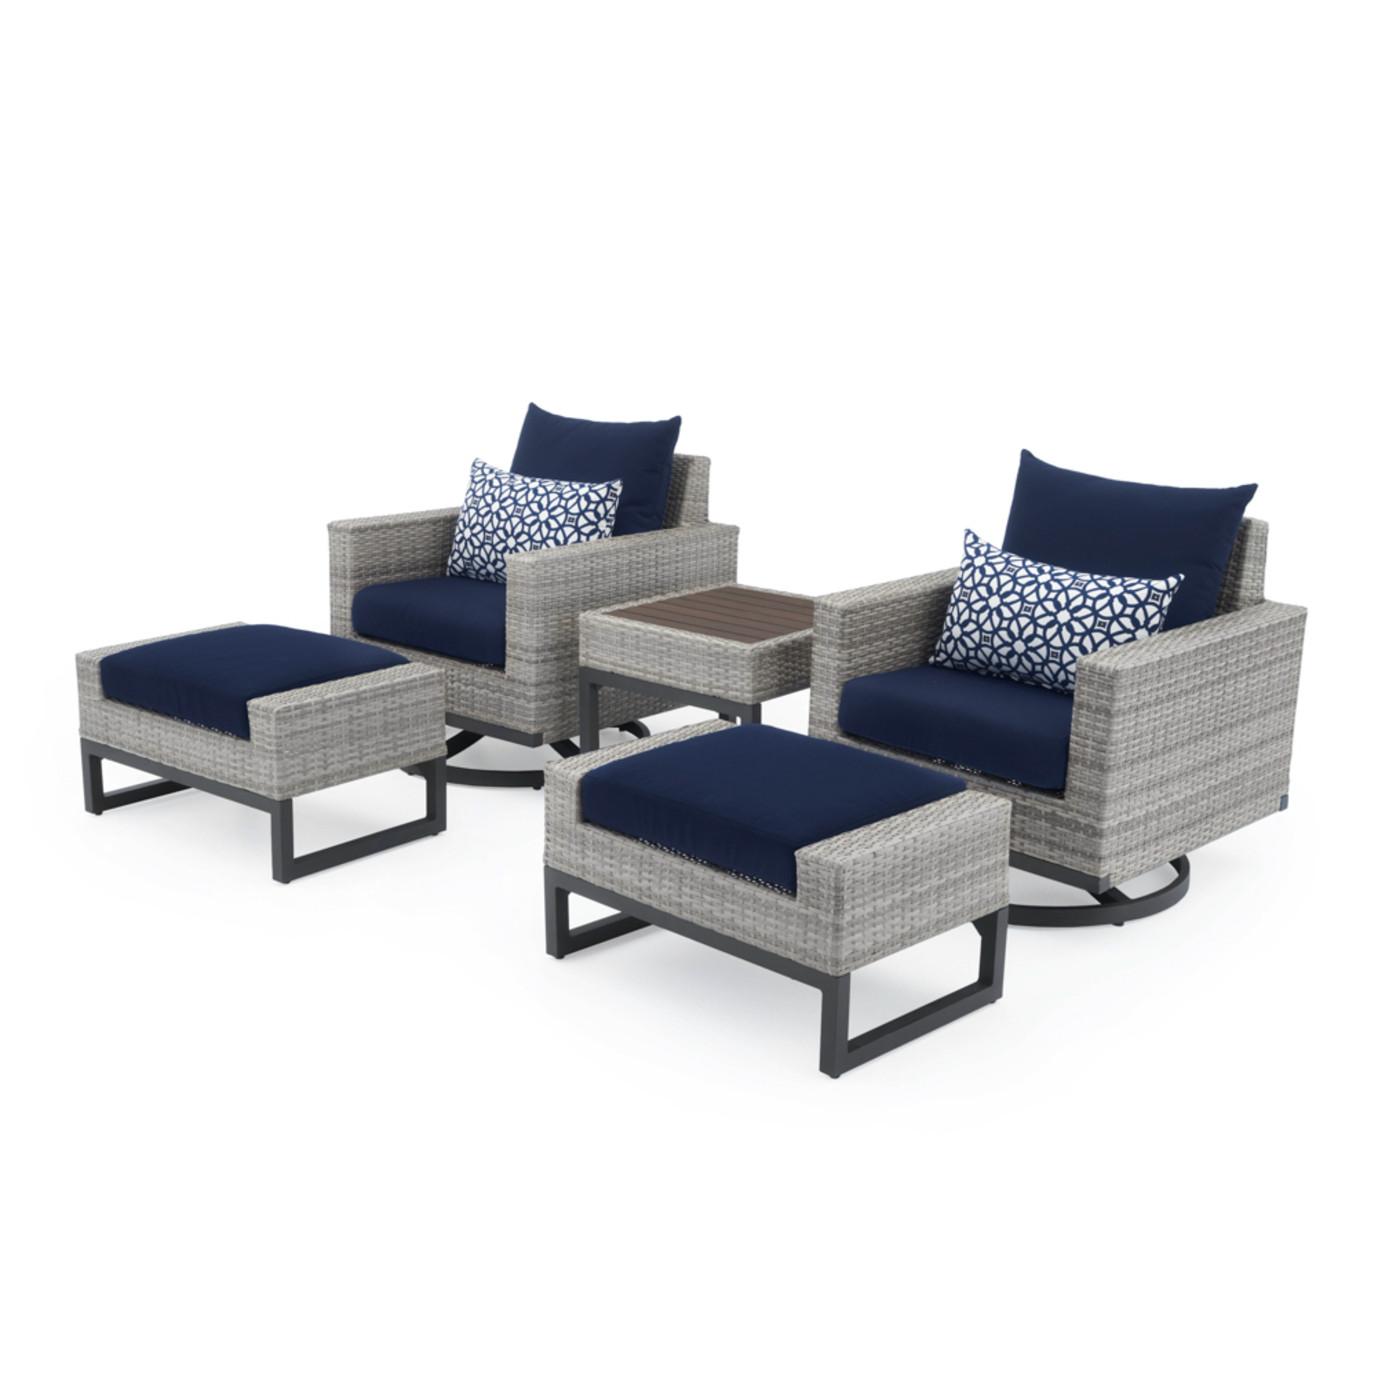 Milo™ Gray 5pc Motion Club Chair Set - Navy Blue